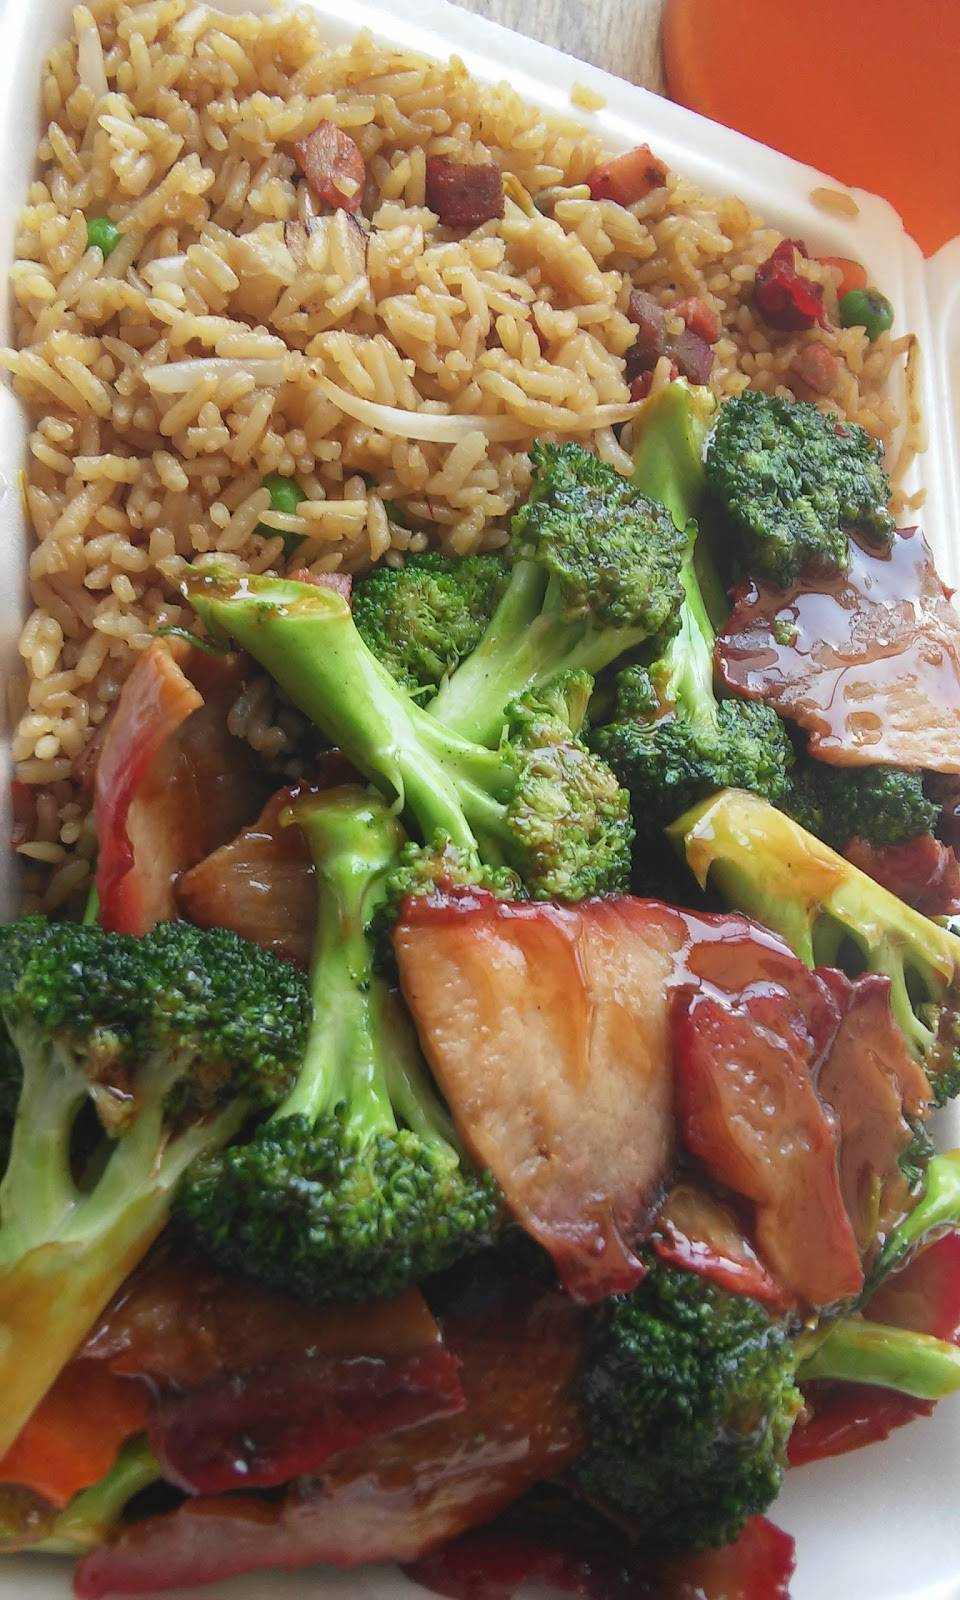 Feng Yuan | restaurant | 922 Broadway, Bayonne, NJ 07002, USA | 2014364888 OR +1 201-436-4888